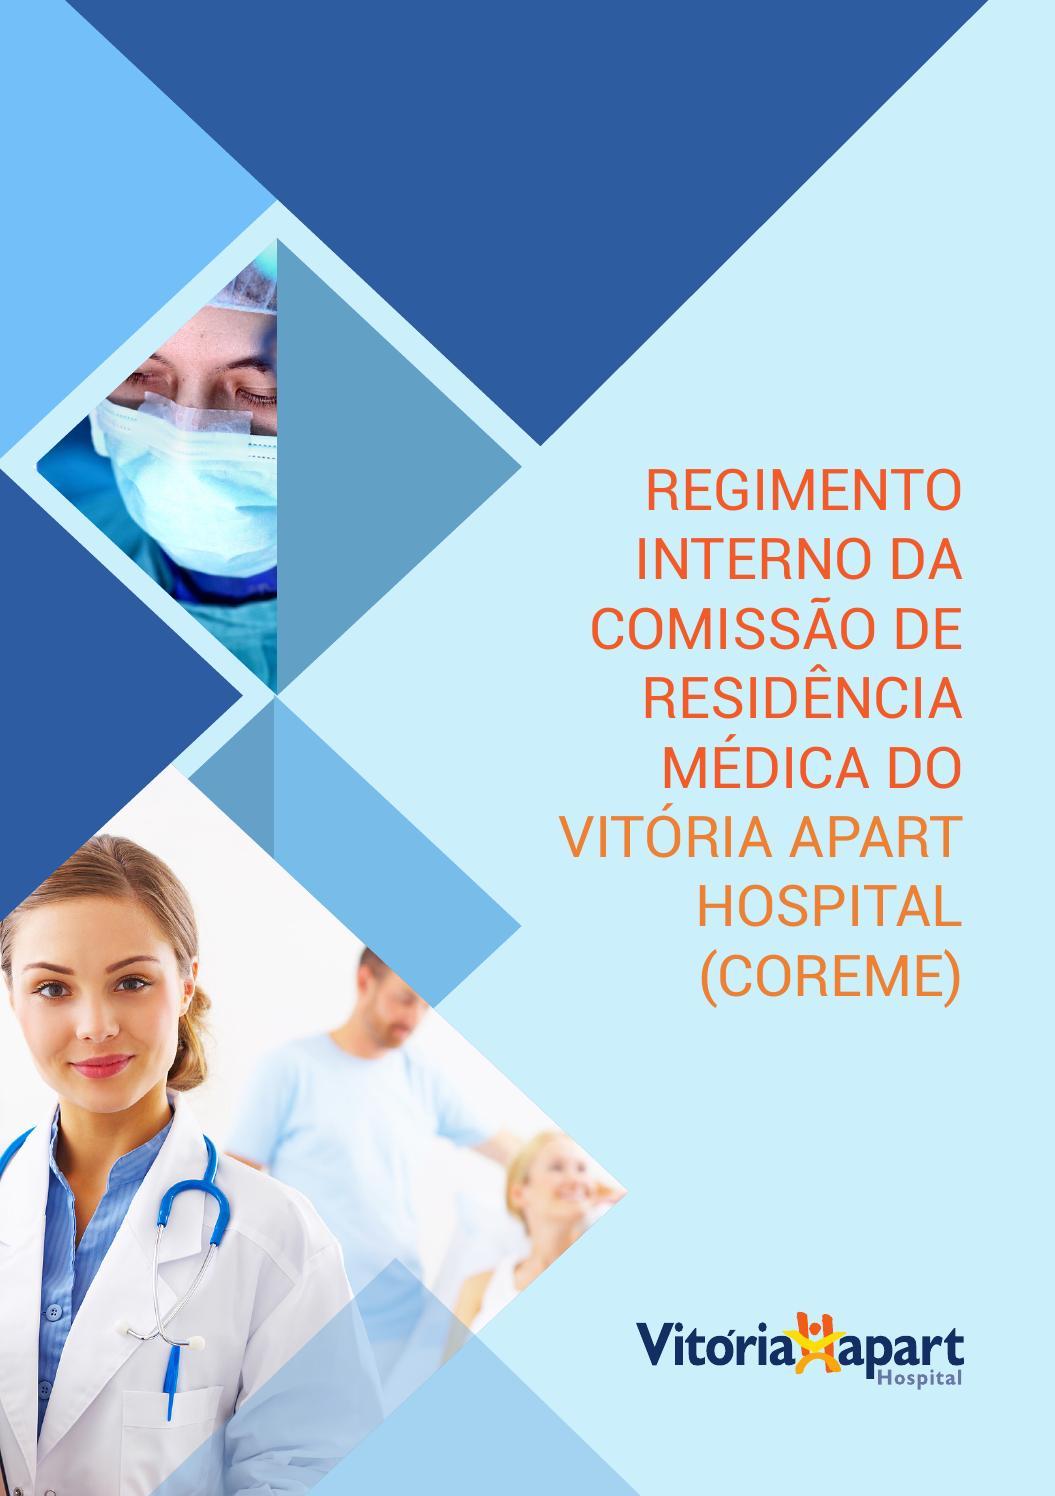 Regimento interno by Vitória Apart Hospital - issuu